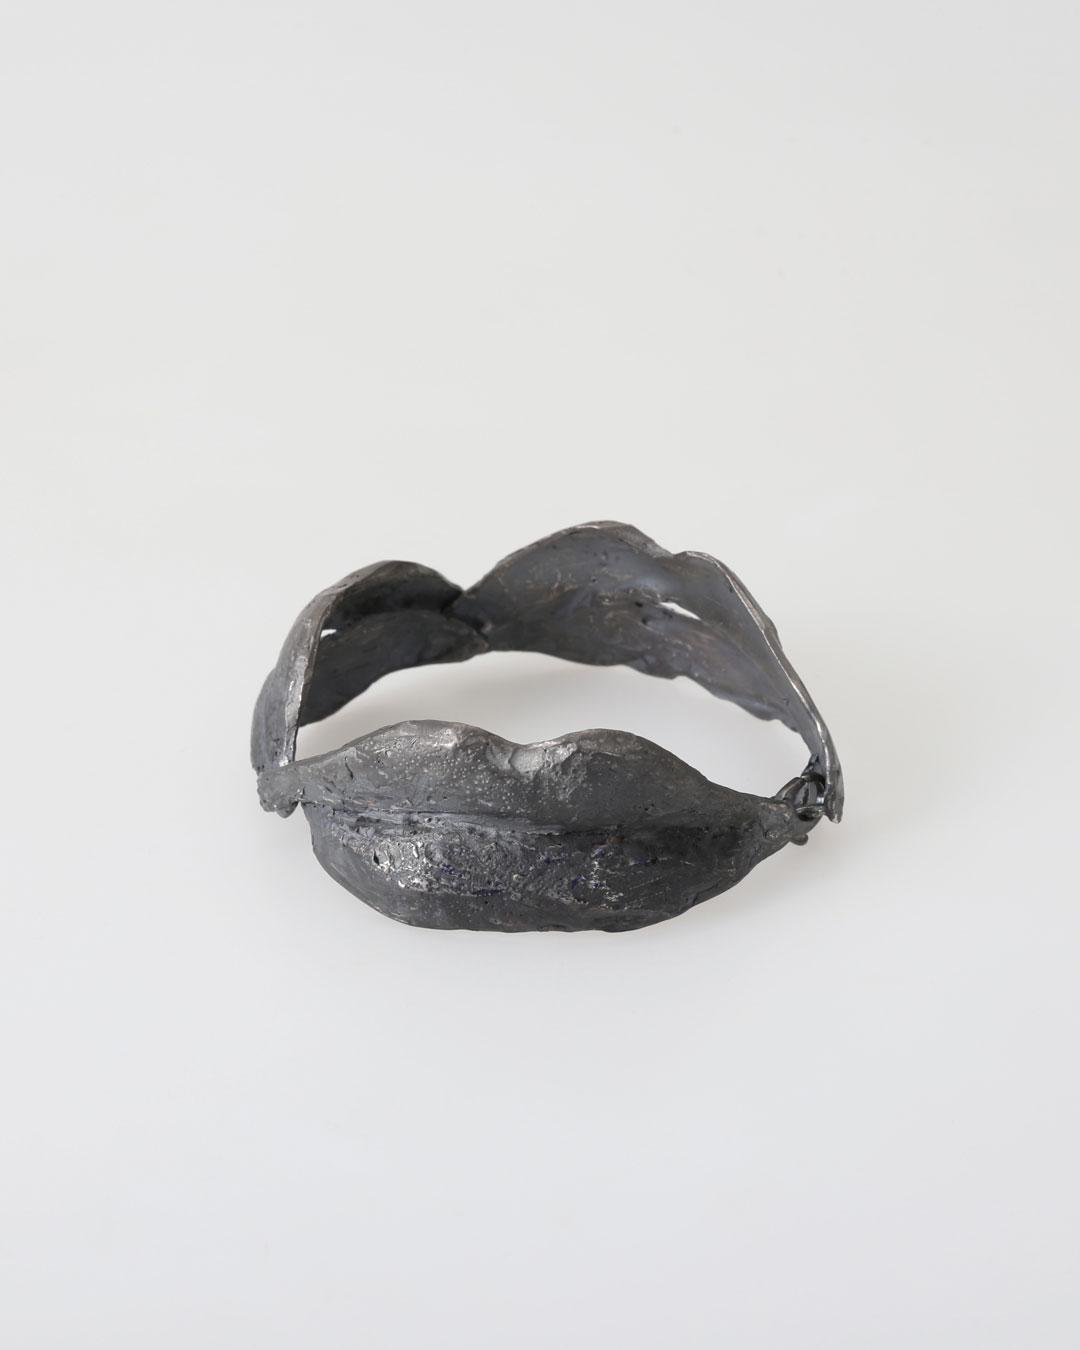 Juliane Brandes, zonder titel, 2017, armband; zilver, ruthenium, 70 x 30 mm, €2430